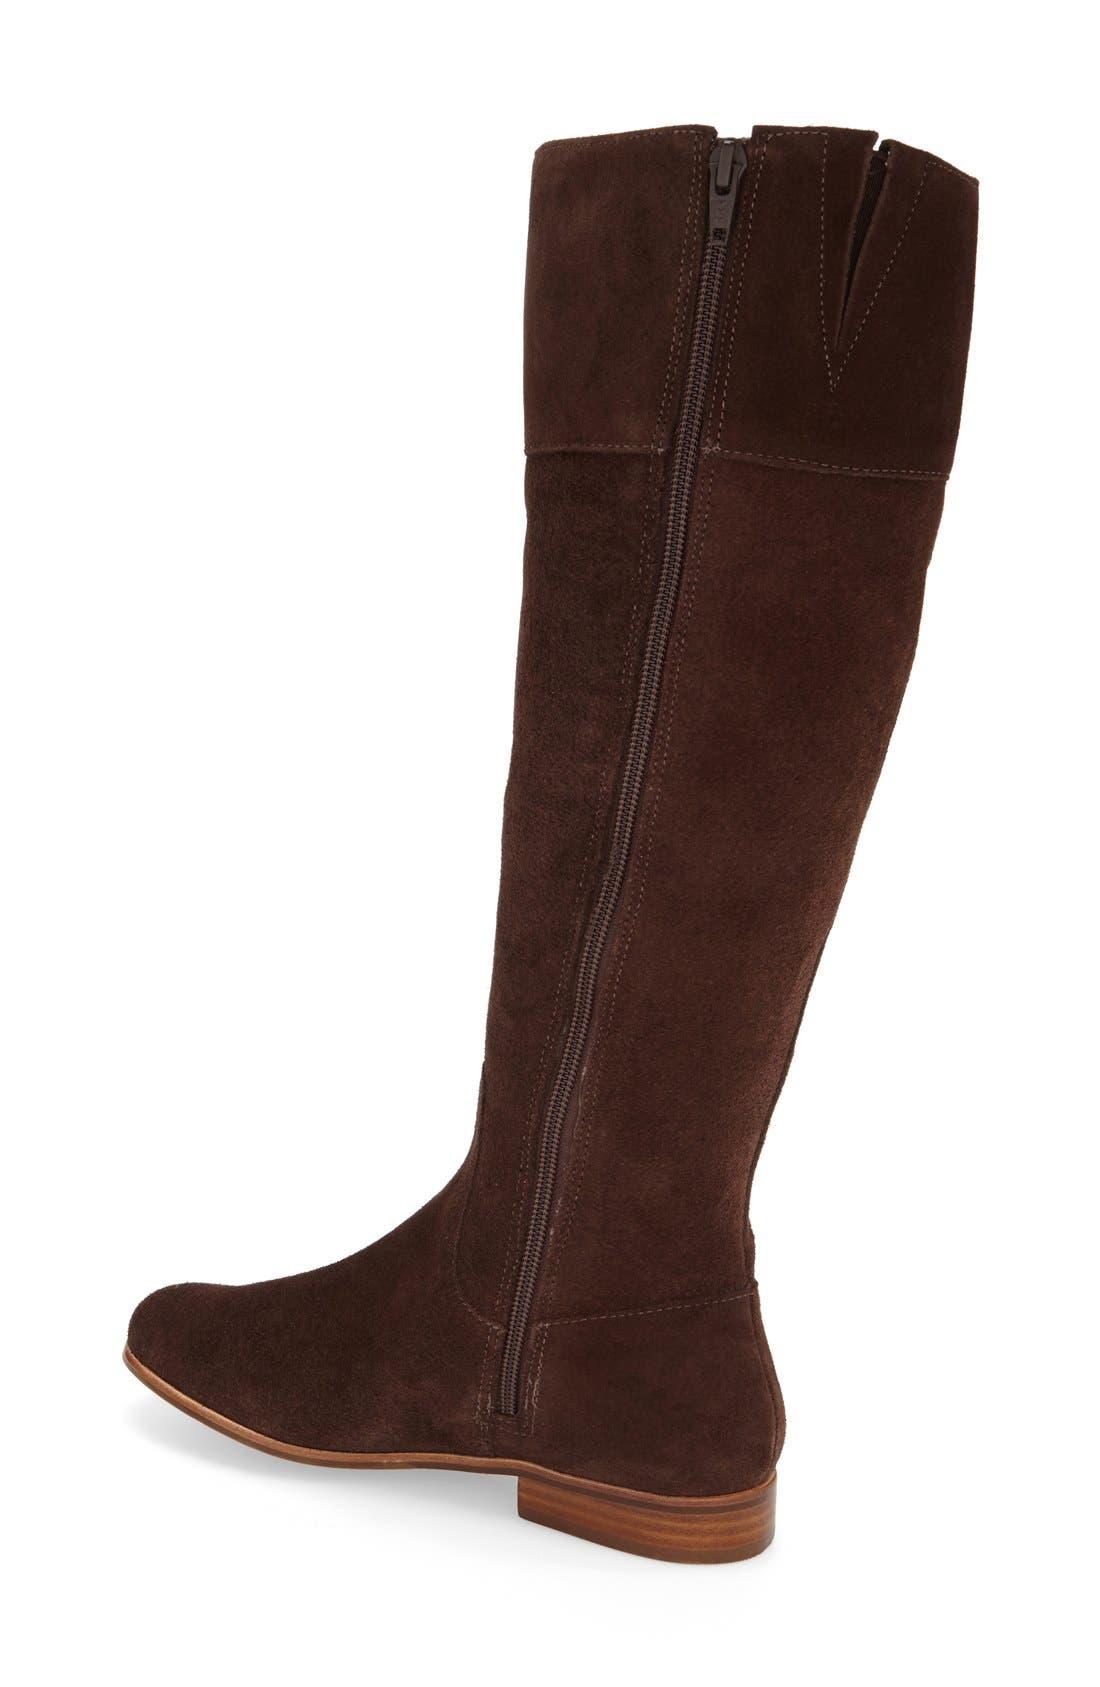 Alternate Image 2  - Jack Rogers 'Tara' Tall Boot (Women)